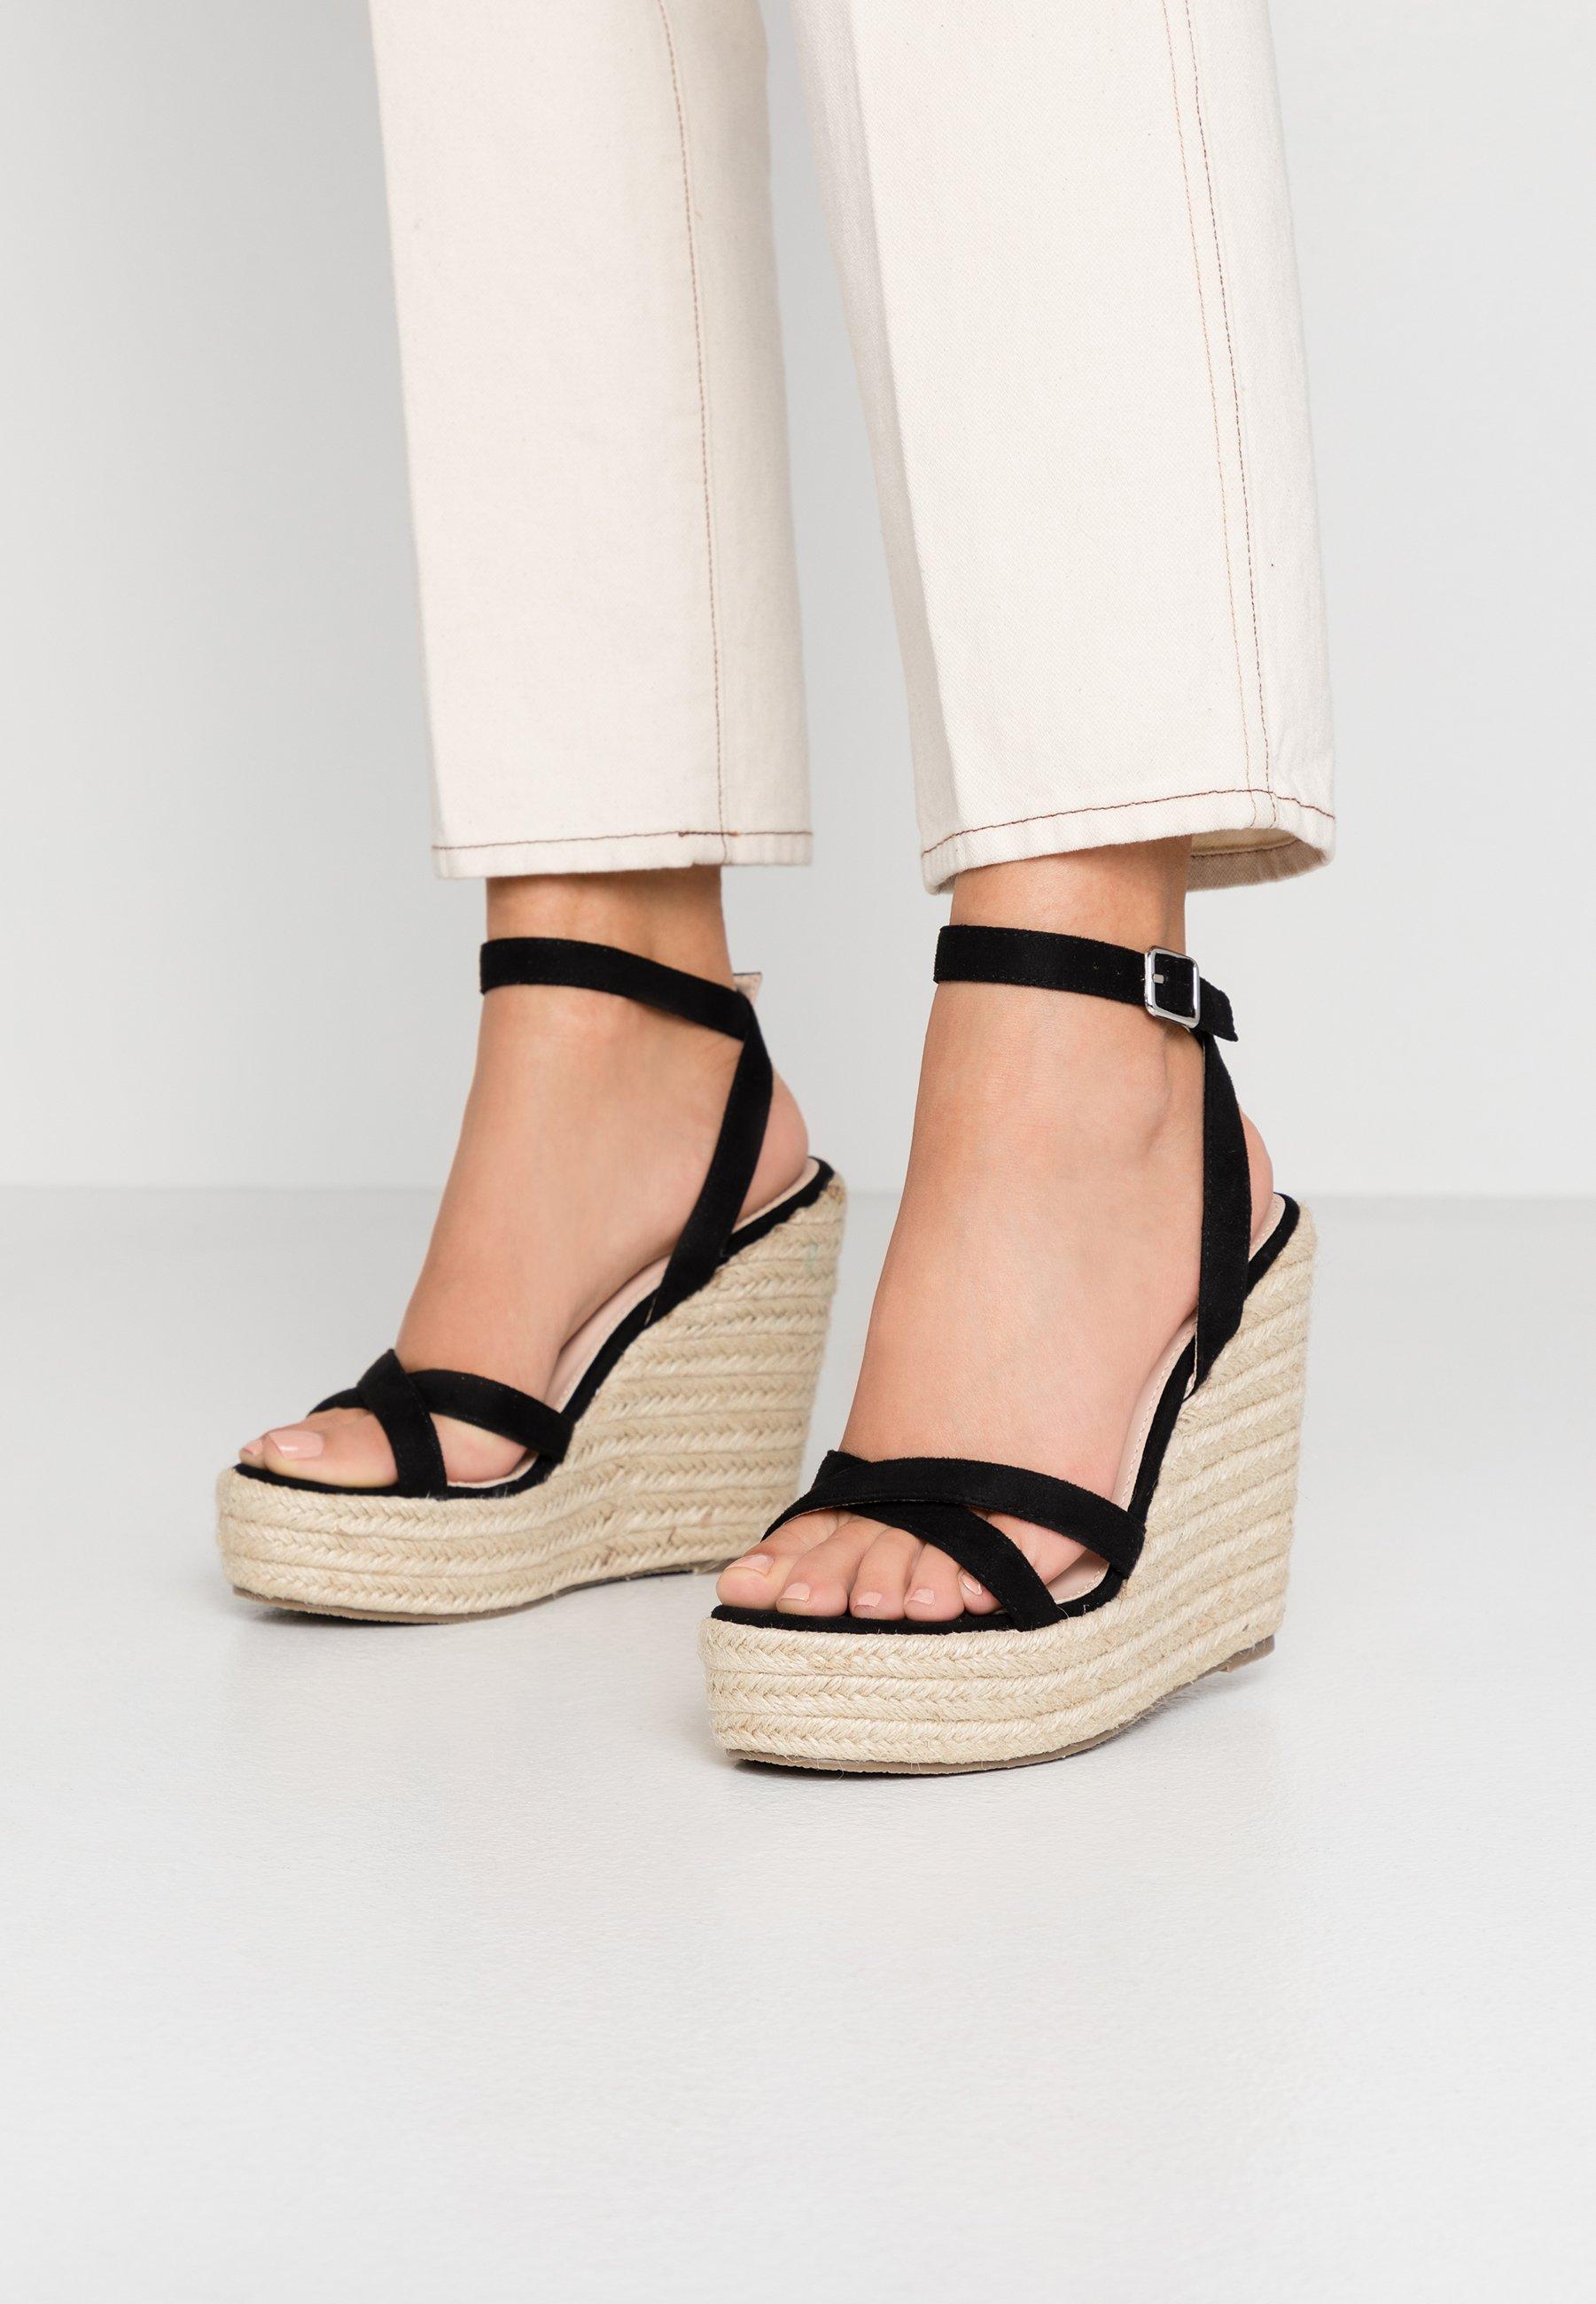 Women ELISHA - High heeled sandals - black